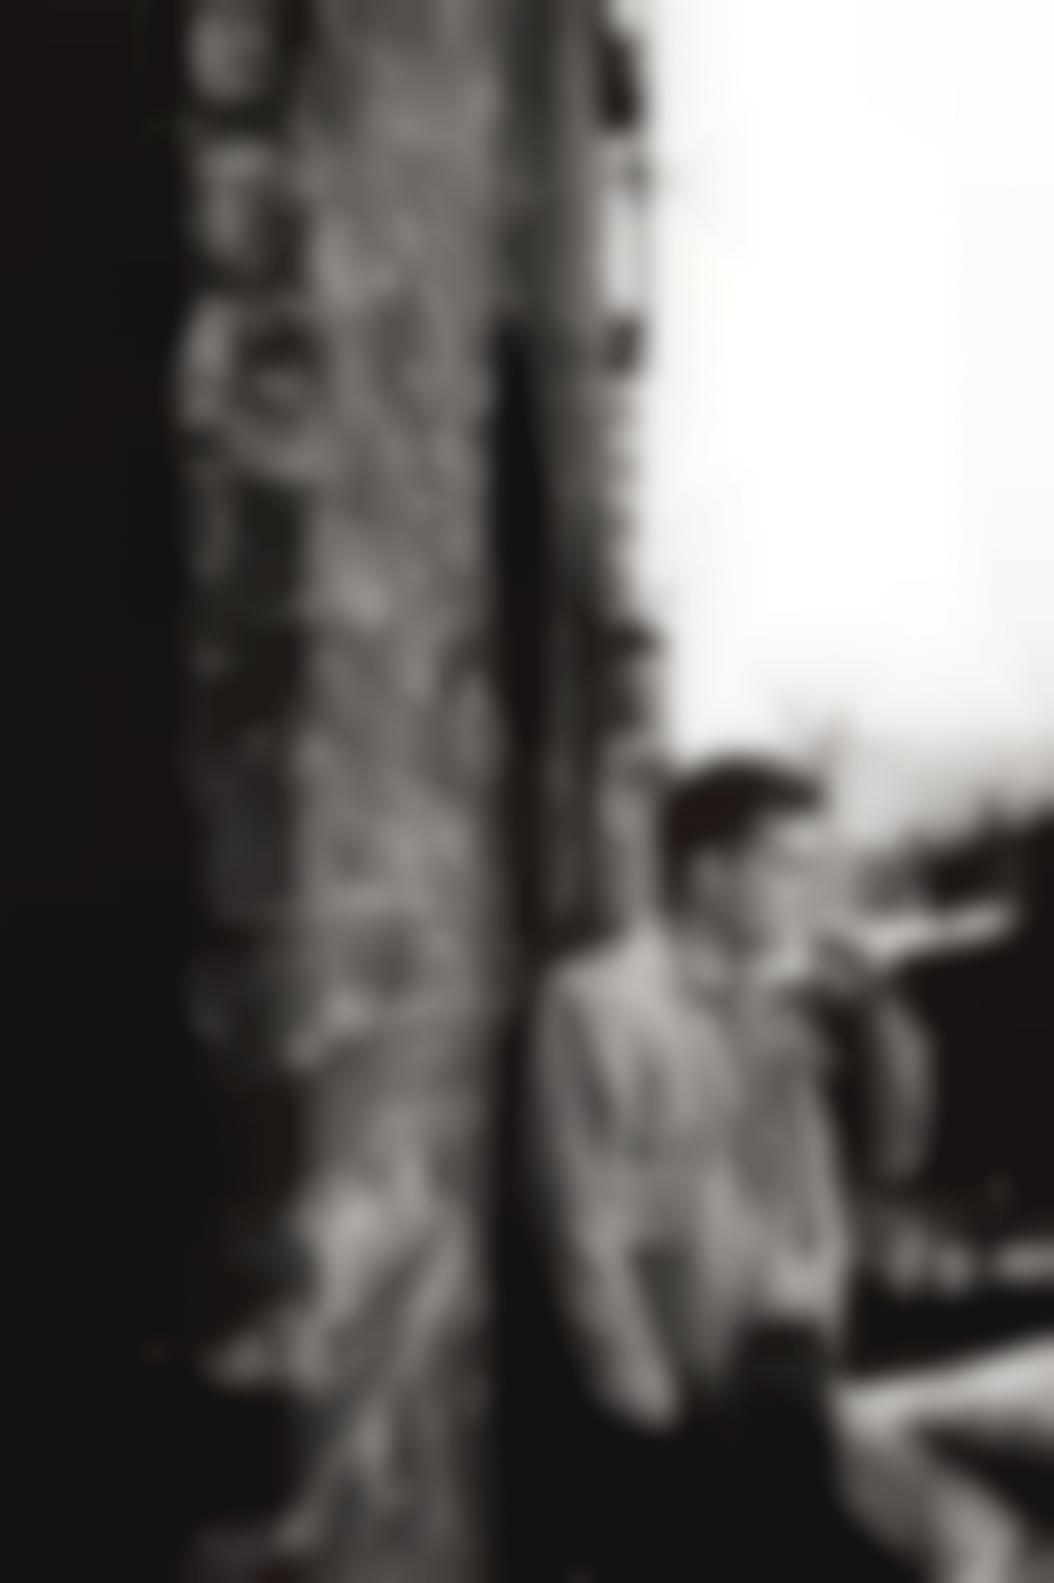 Allen Ginsberg - Jack Kerouac (Fire Escape, New York)-1953